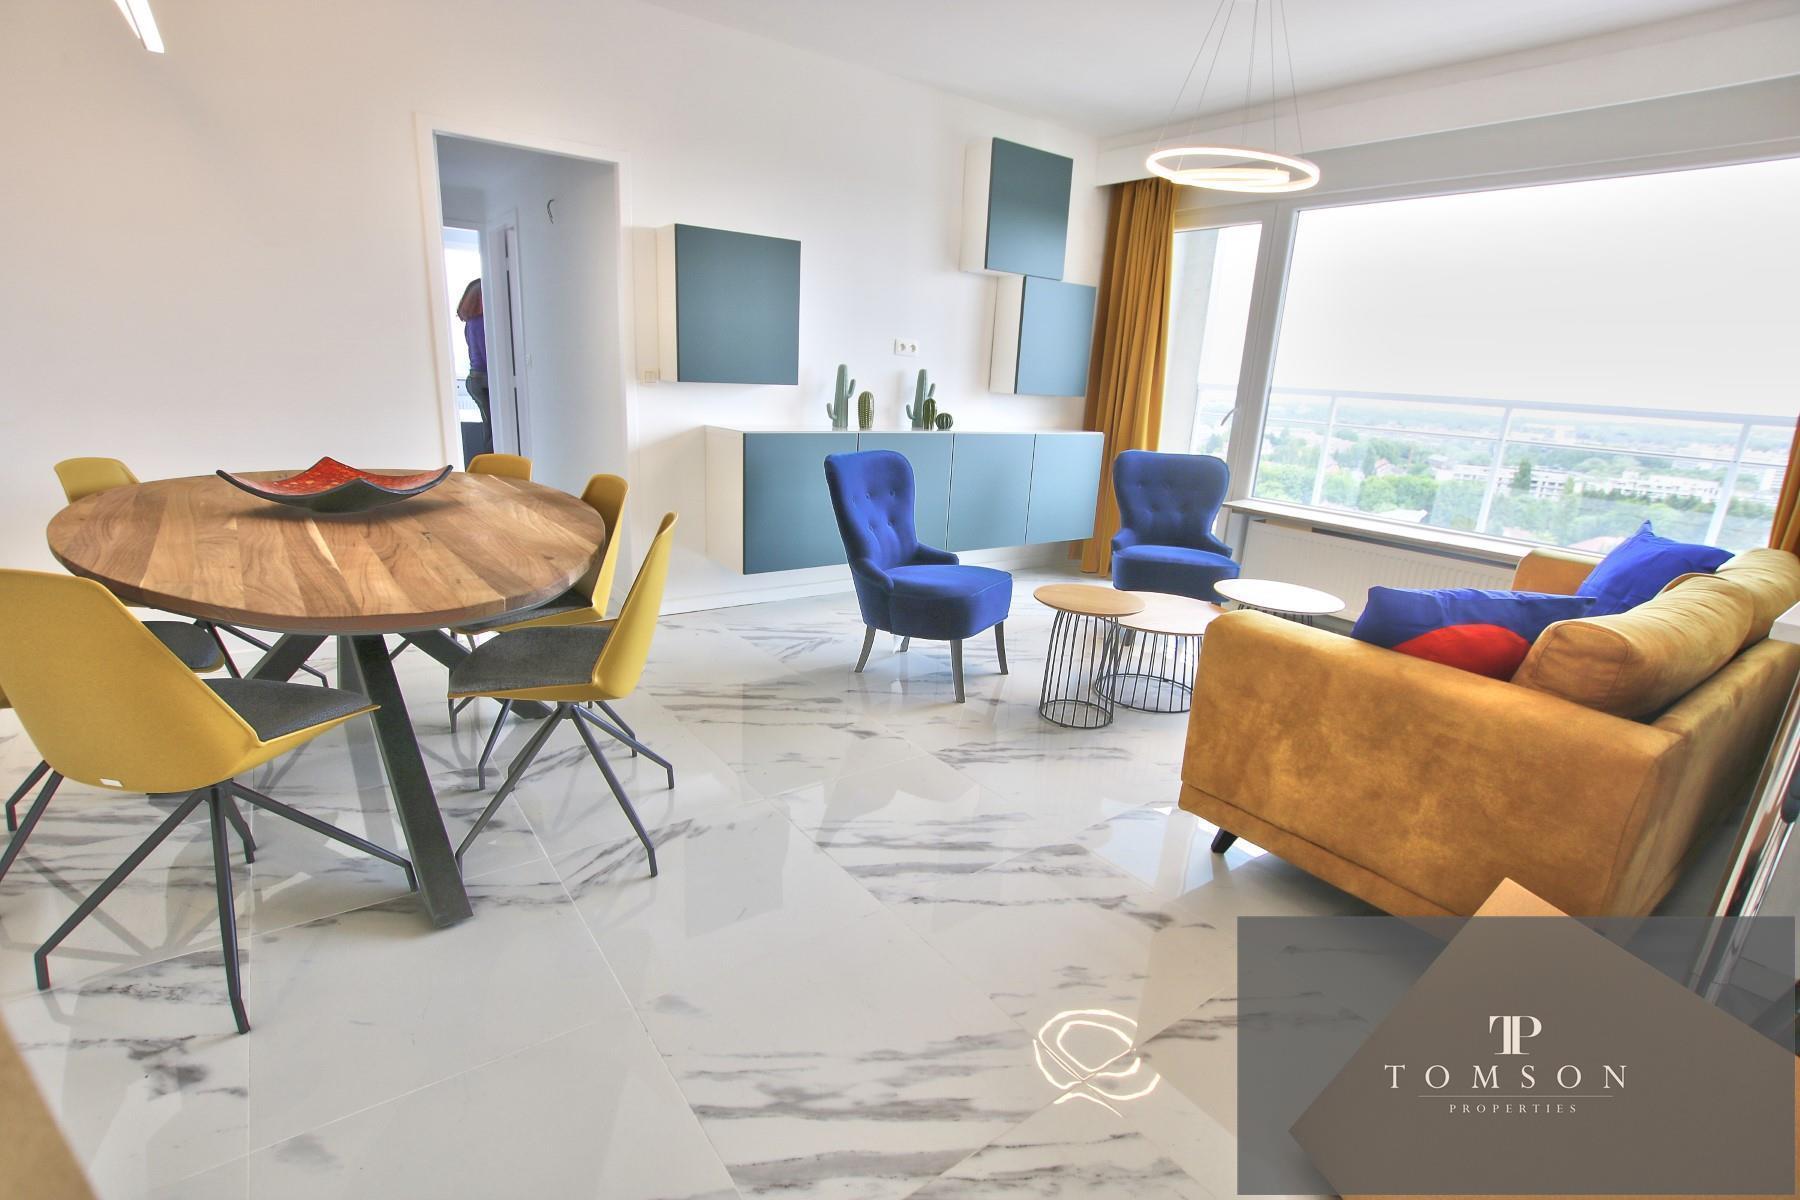 Appartement - Woluwe-Saint-Lambert - #4530512-0